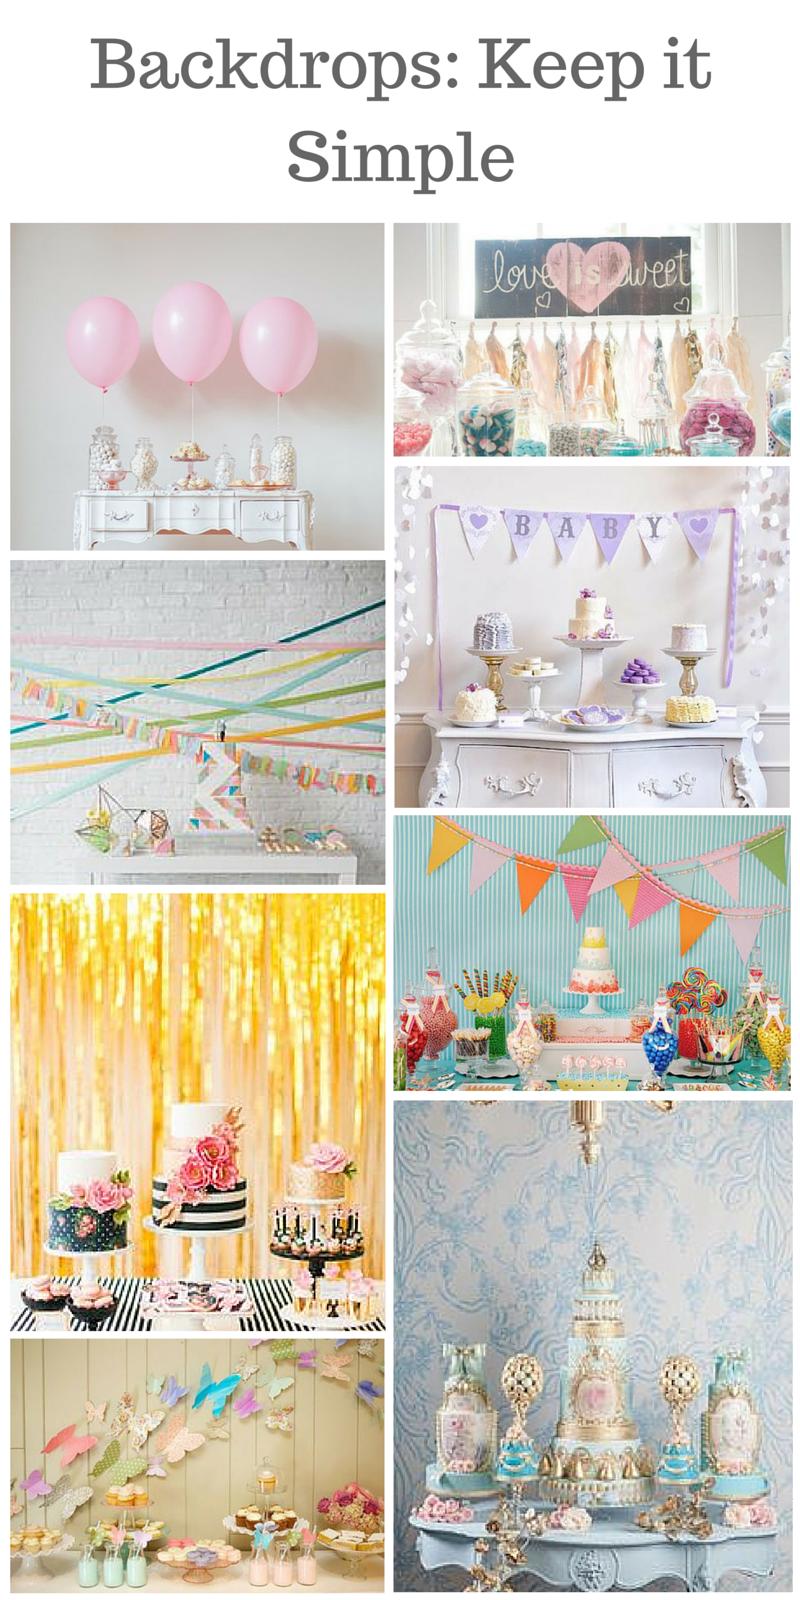 Photo Credits: 100 Layer Cake , Style Me Pretty , 100 Layer Cake , PopSugar , Kara's Party Ideas , Kara's Party Ideas , Nova Cosmopolitan , The Little Umbrella